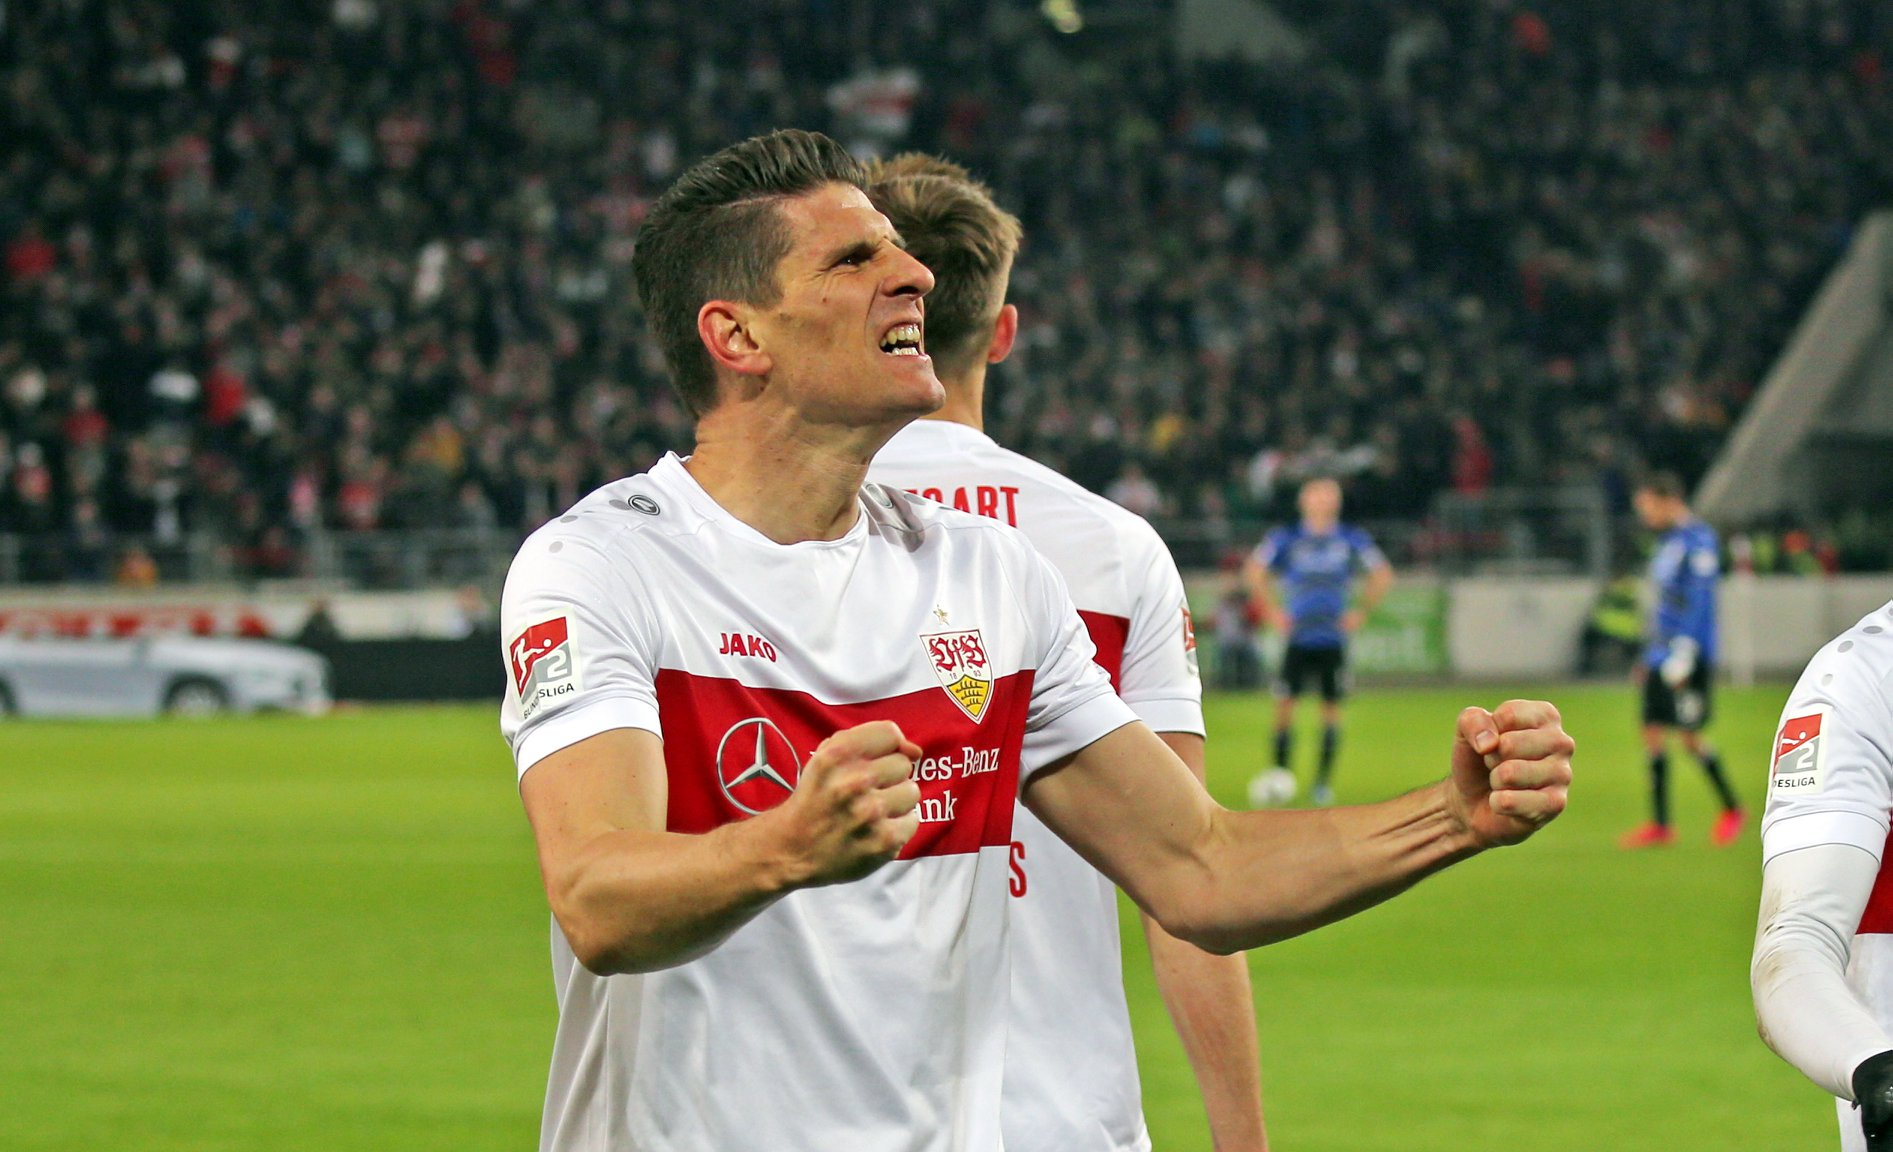 mario-gomez-si-a-anuntat-retragerea-din-fotbal-la-varsta-de-34-de-ani